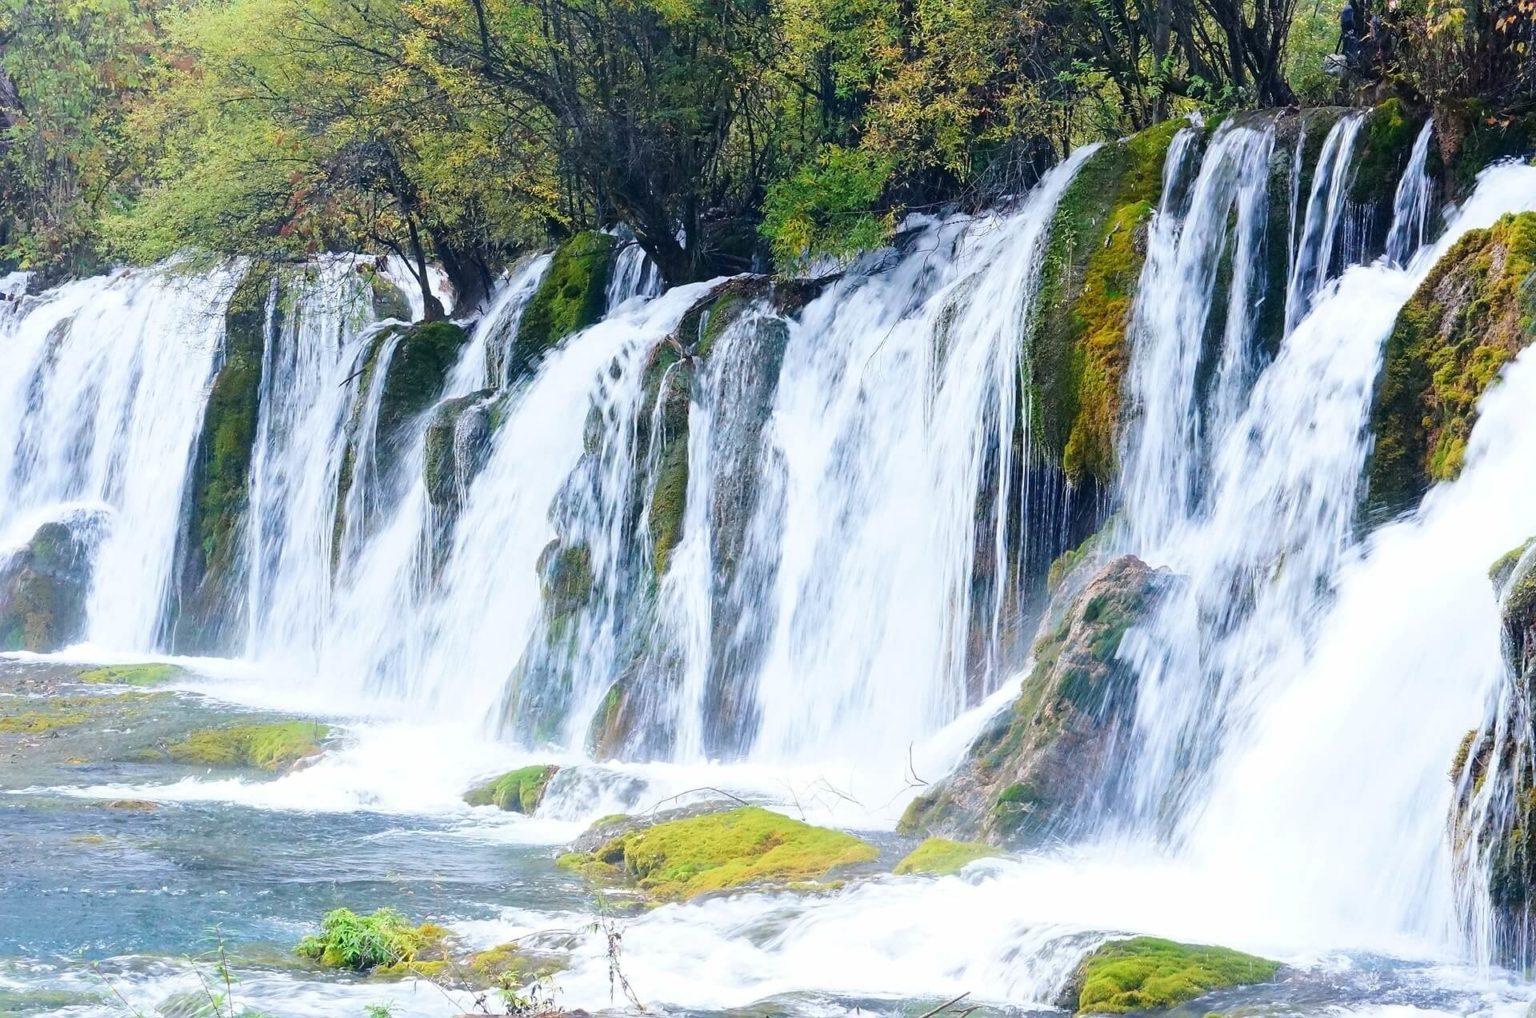 Национальный парк Цзючжайгоу, Китай